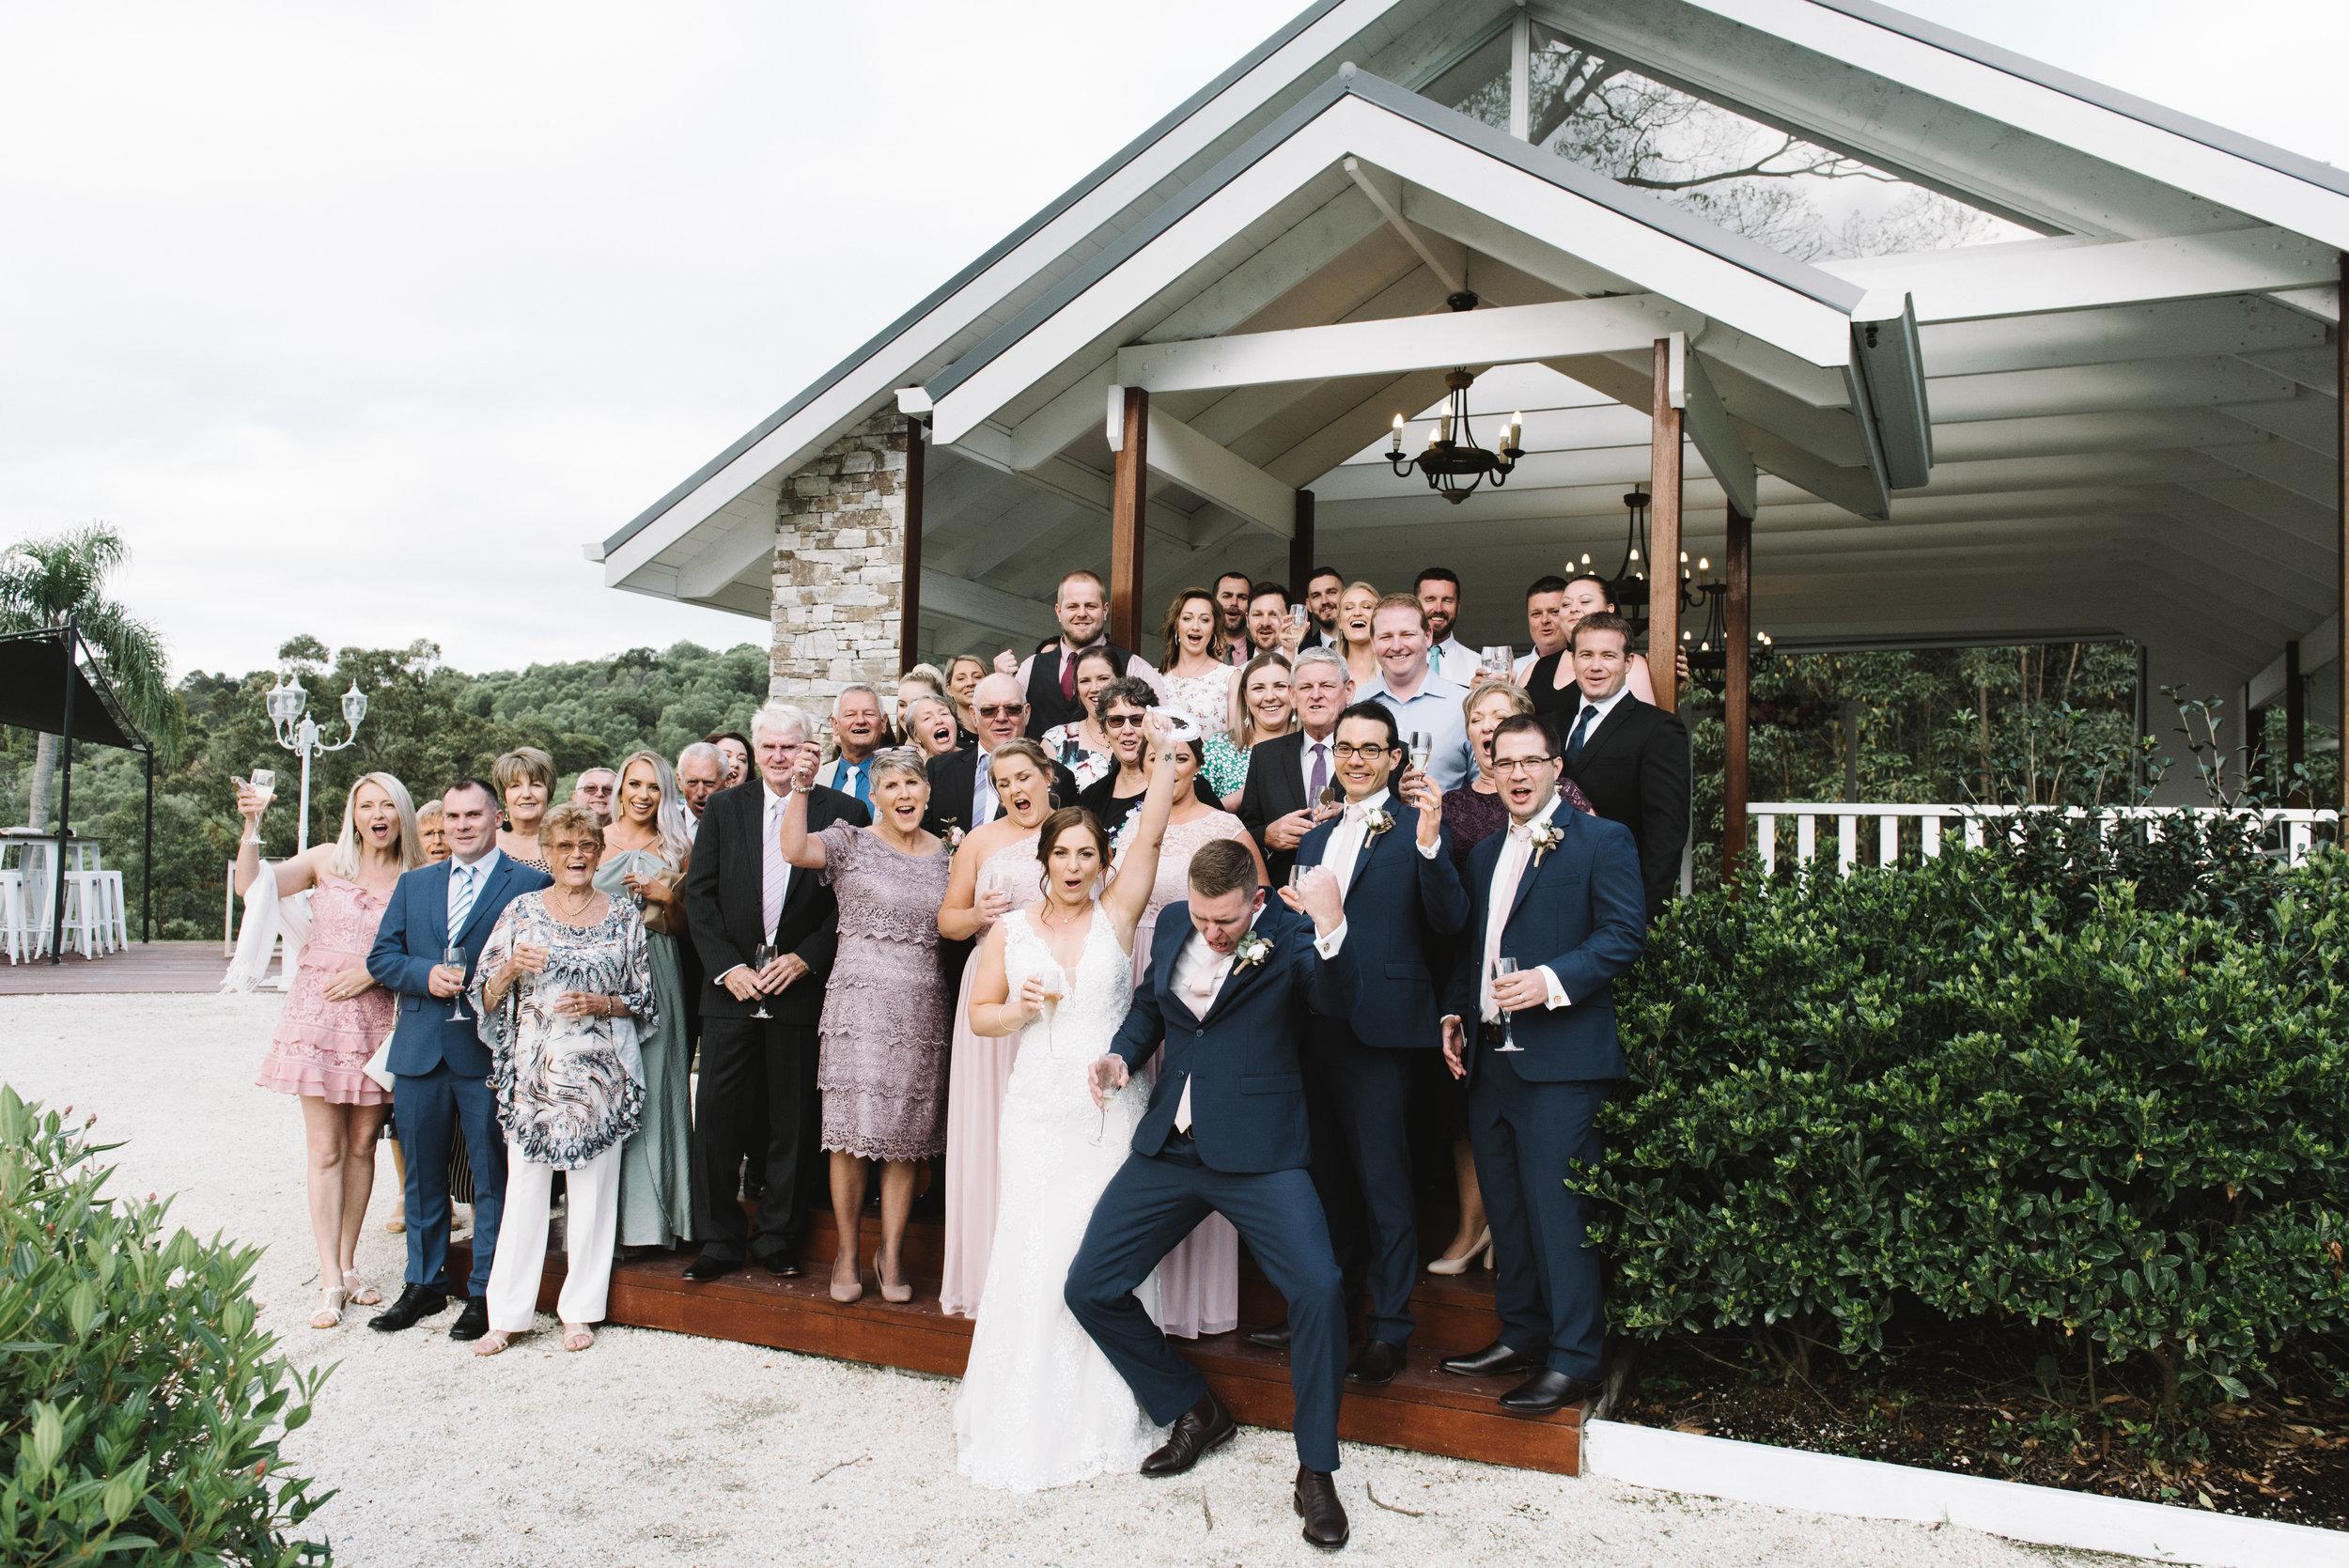 LAURENOLIVIA-austinvilla-estate-wedding-49.jpg